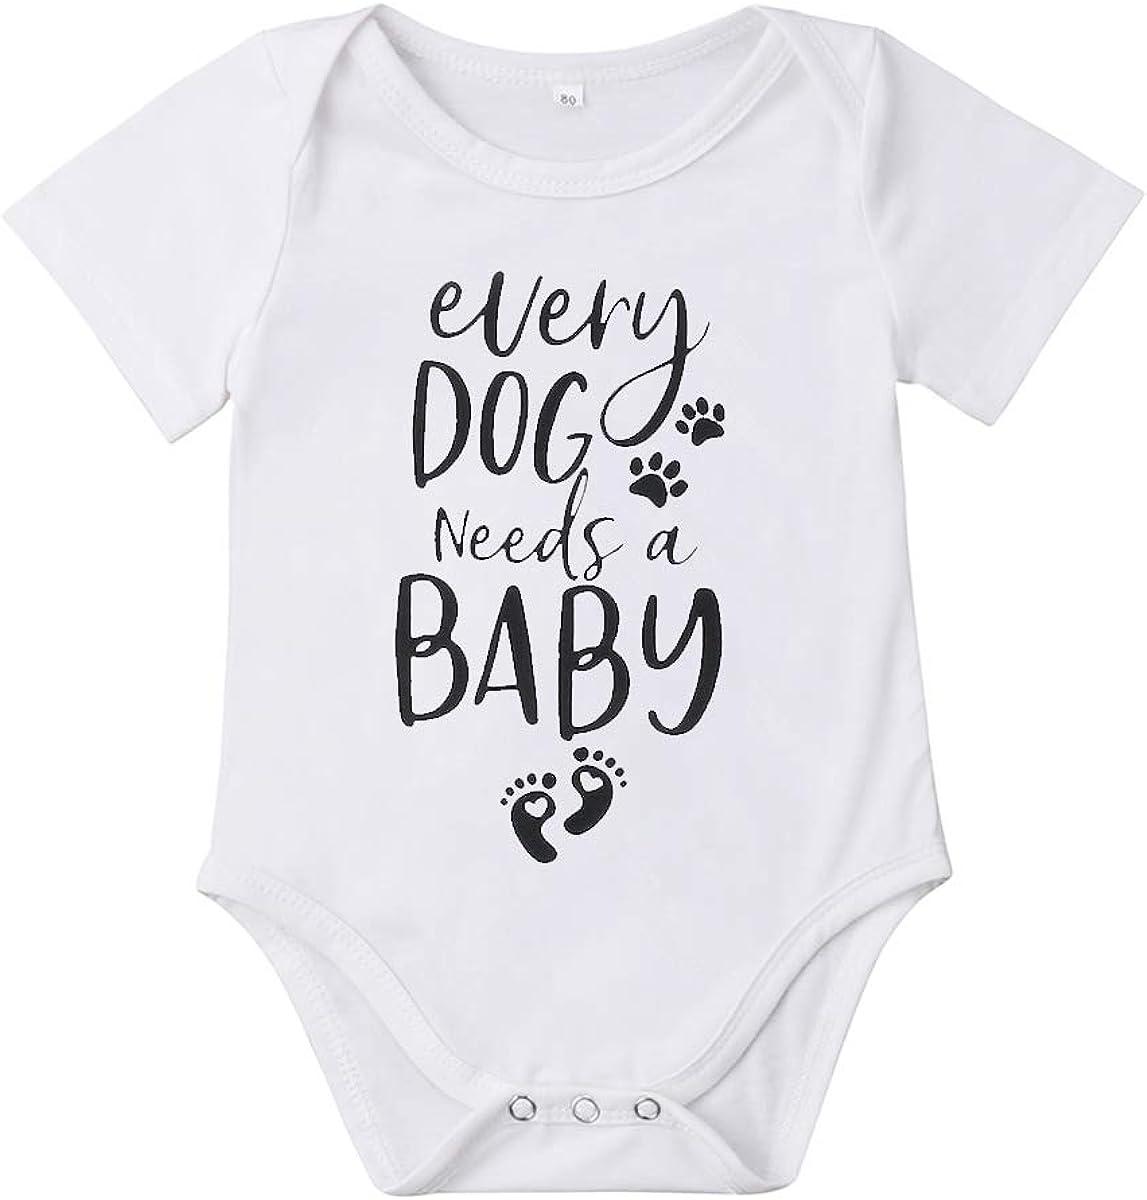 Infant Newborn Japan Maker New Baby Bodysuit Boys Girls Short Piece F 5 popular One Sleeve